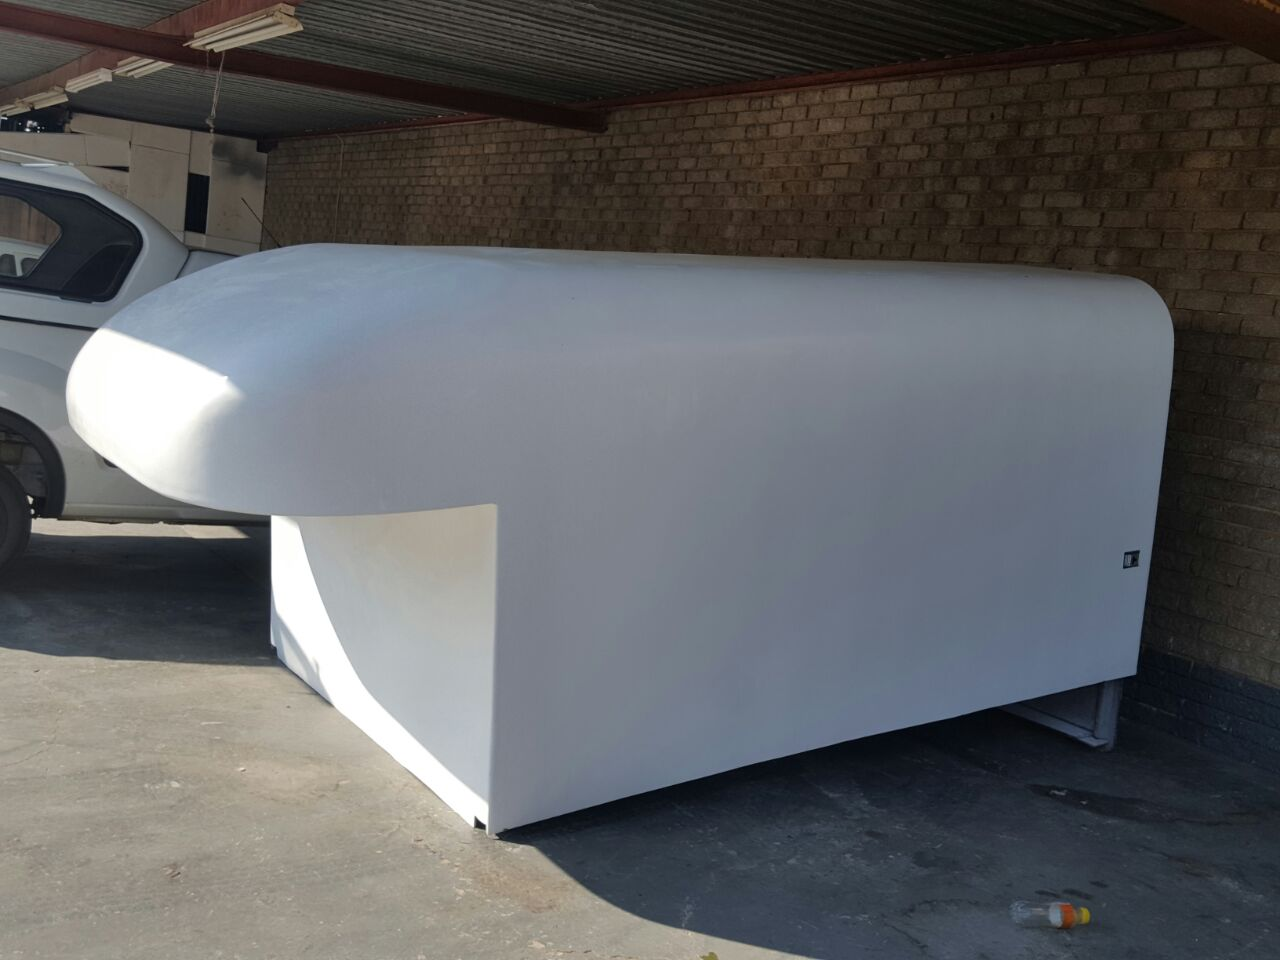 Hyundai H100 - Kia K2700 Brand New Gc Space Saver Canopy for sale!!